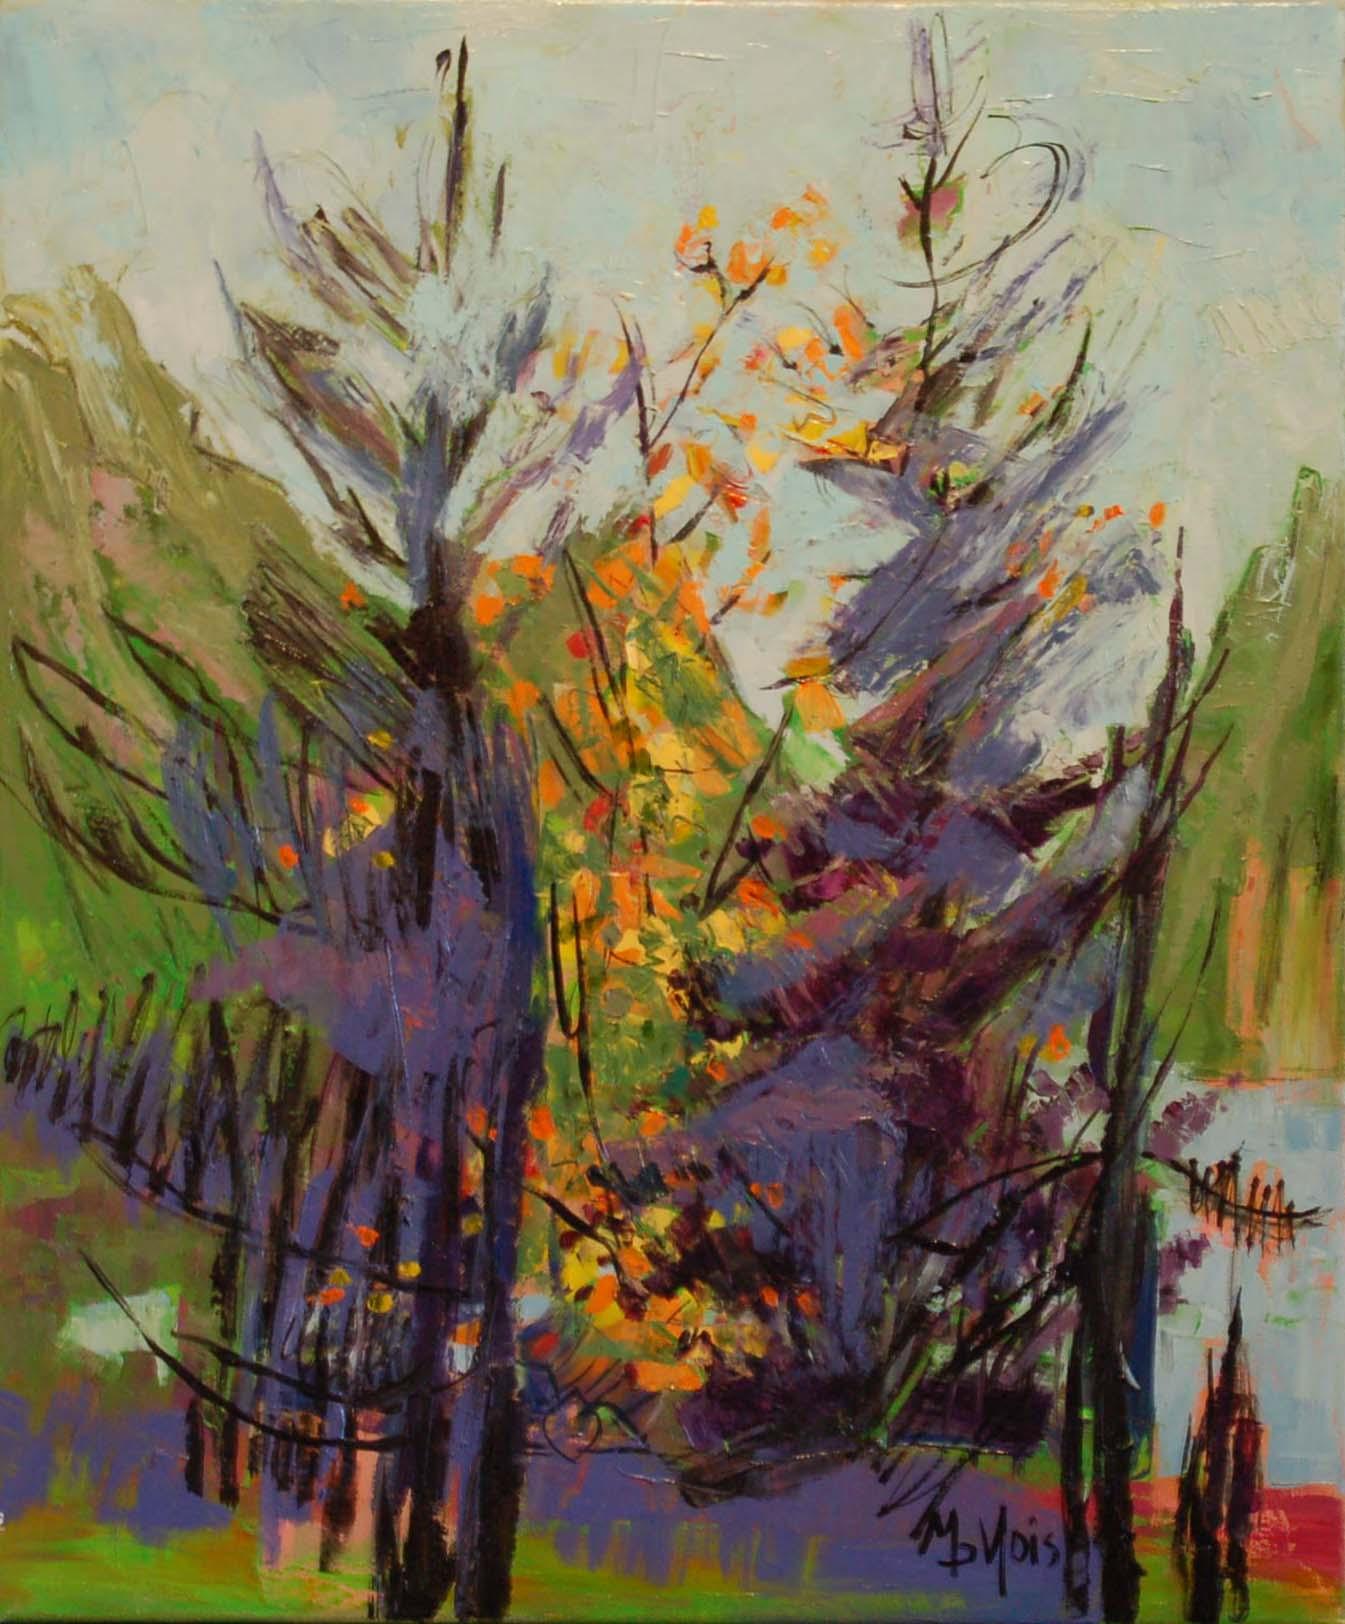 "L'Epopee de la Traverse, Oil on canvas, 20"" x 24"""